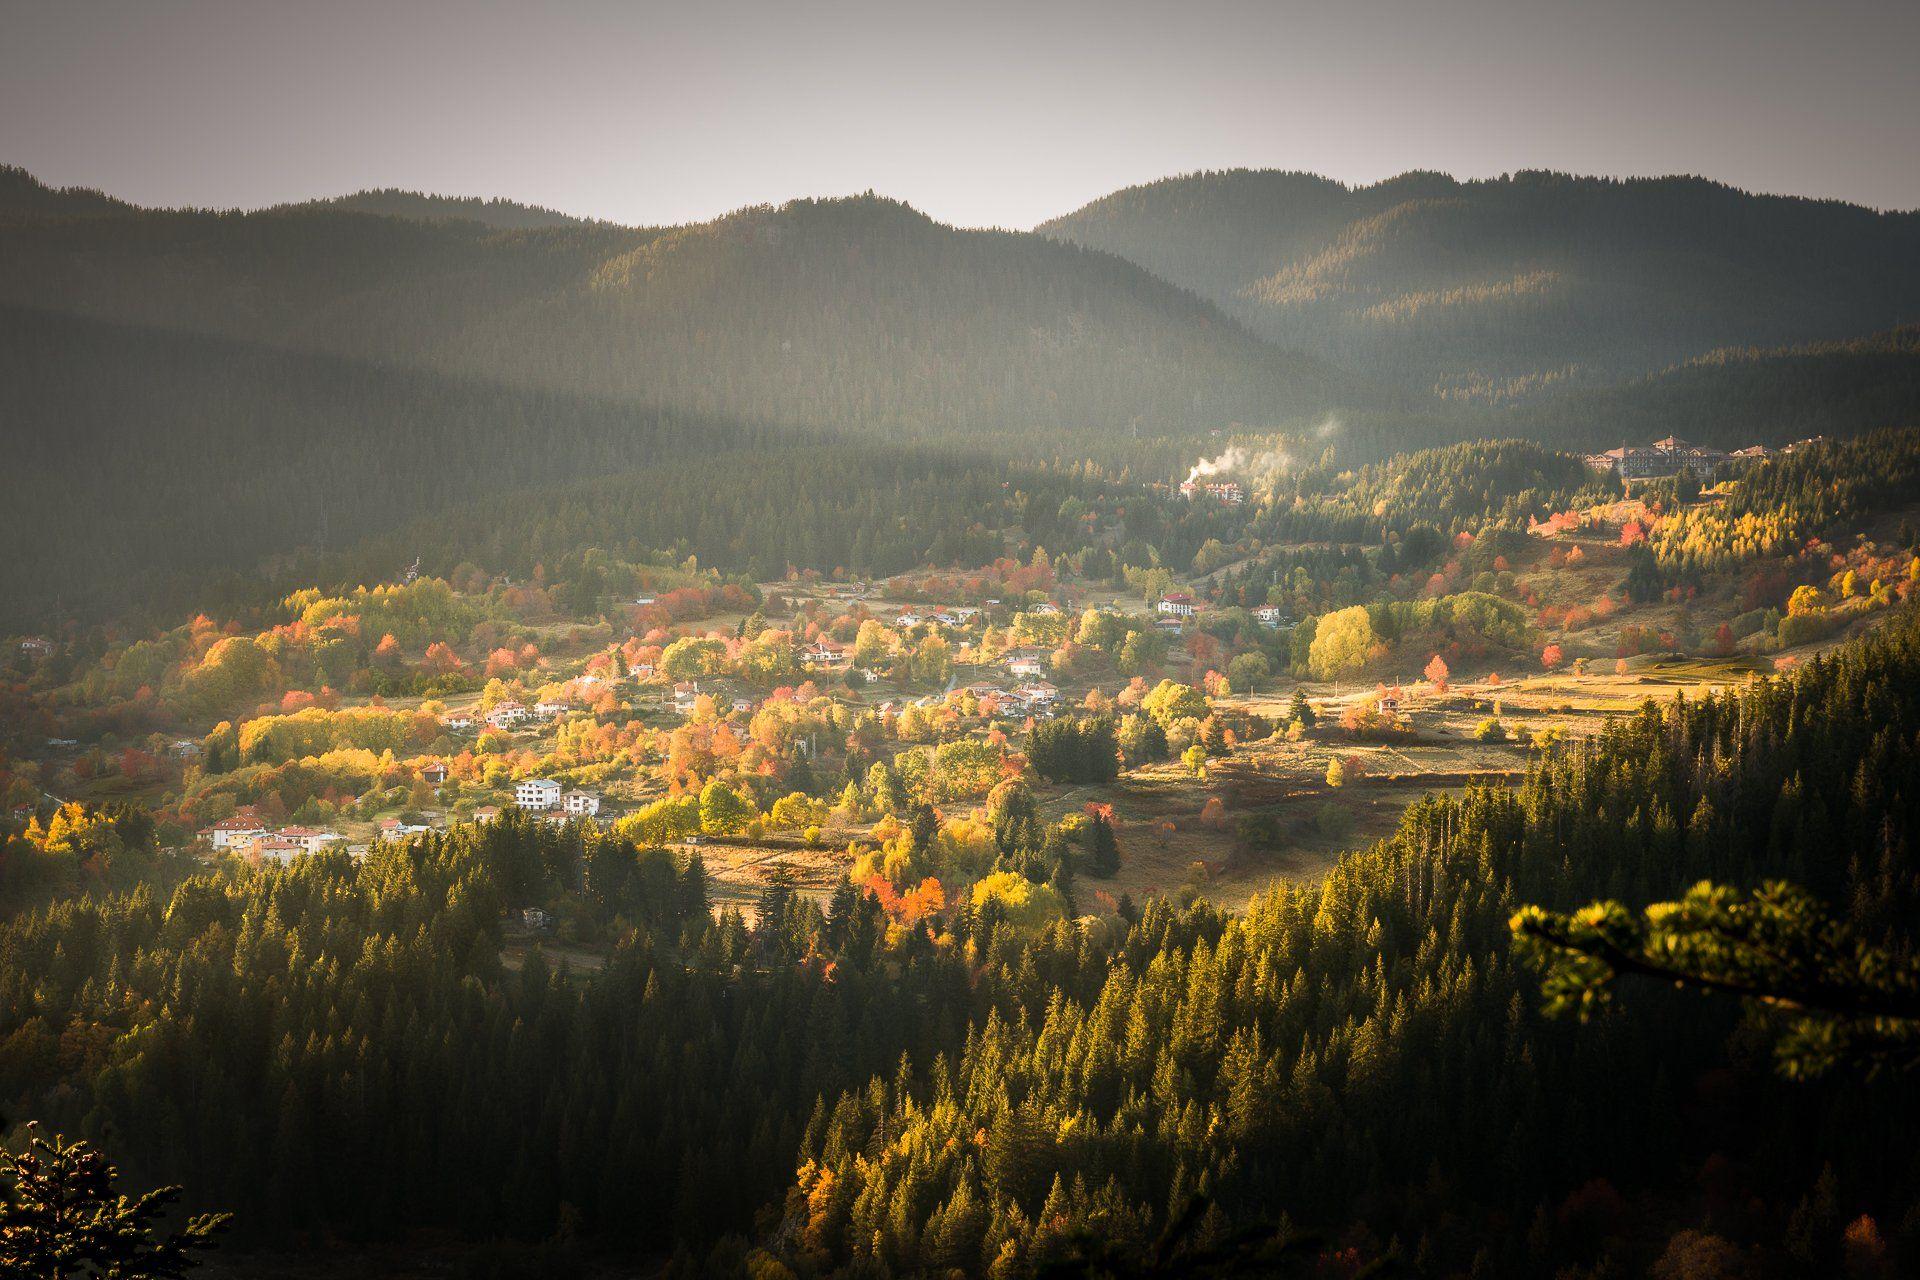 #rays, #autumn, #smolyan, #bulgaria, #house, #sunset, #travel, #journey, #rhodope_mountains, Mая Врънгова